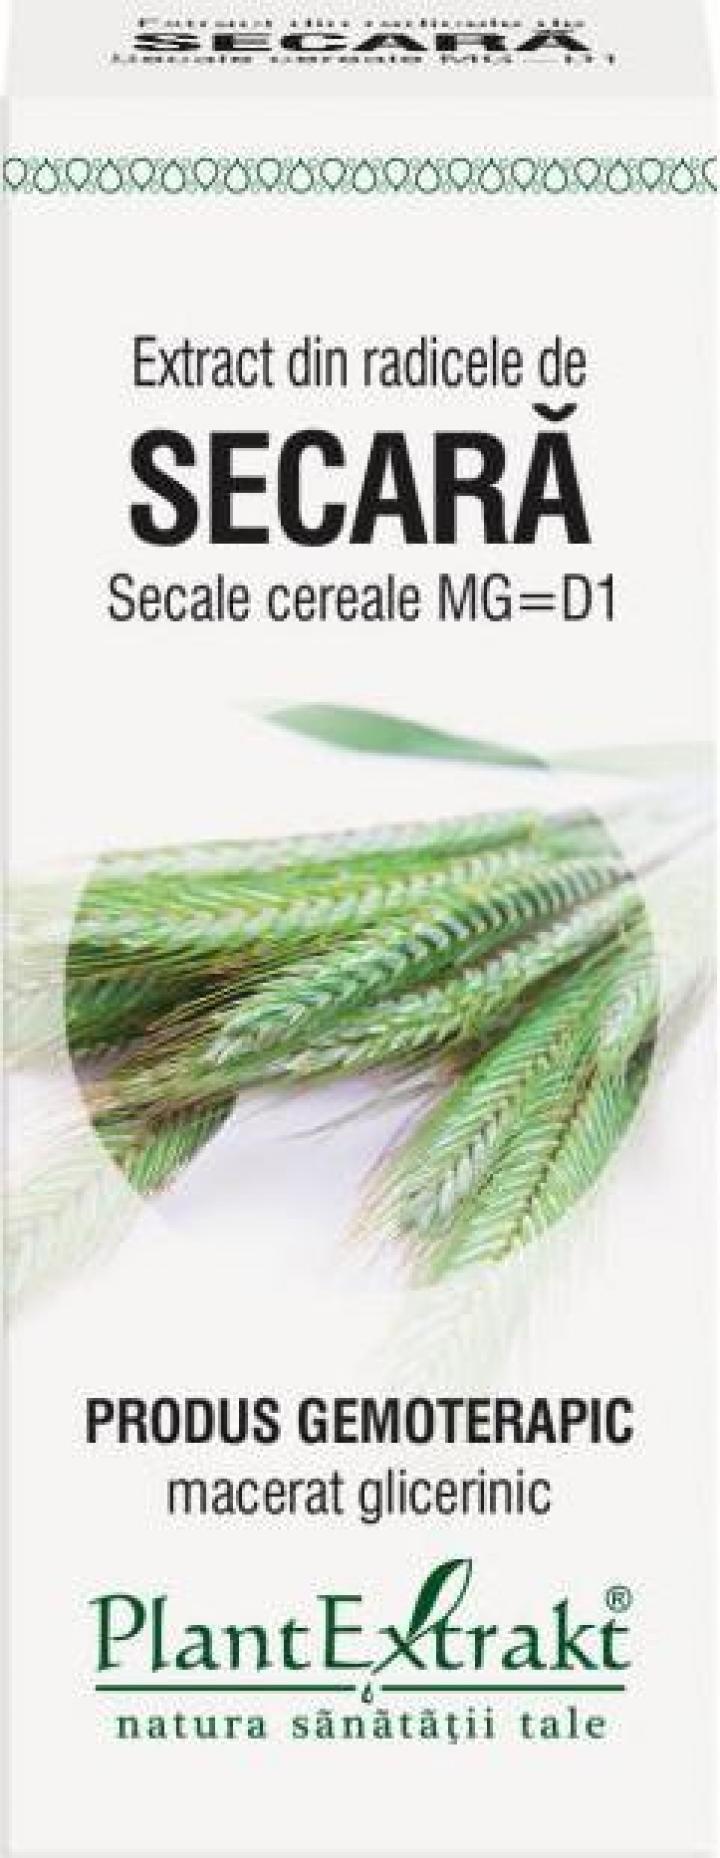 Extract radicele secara